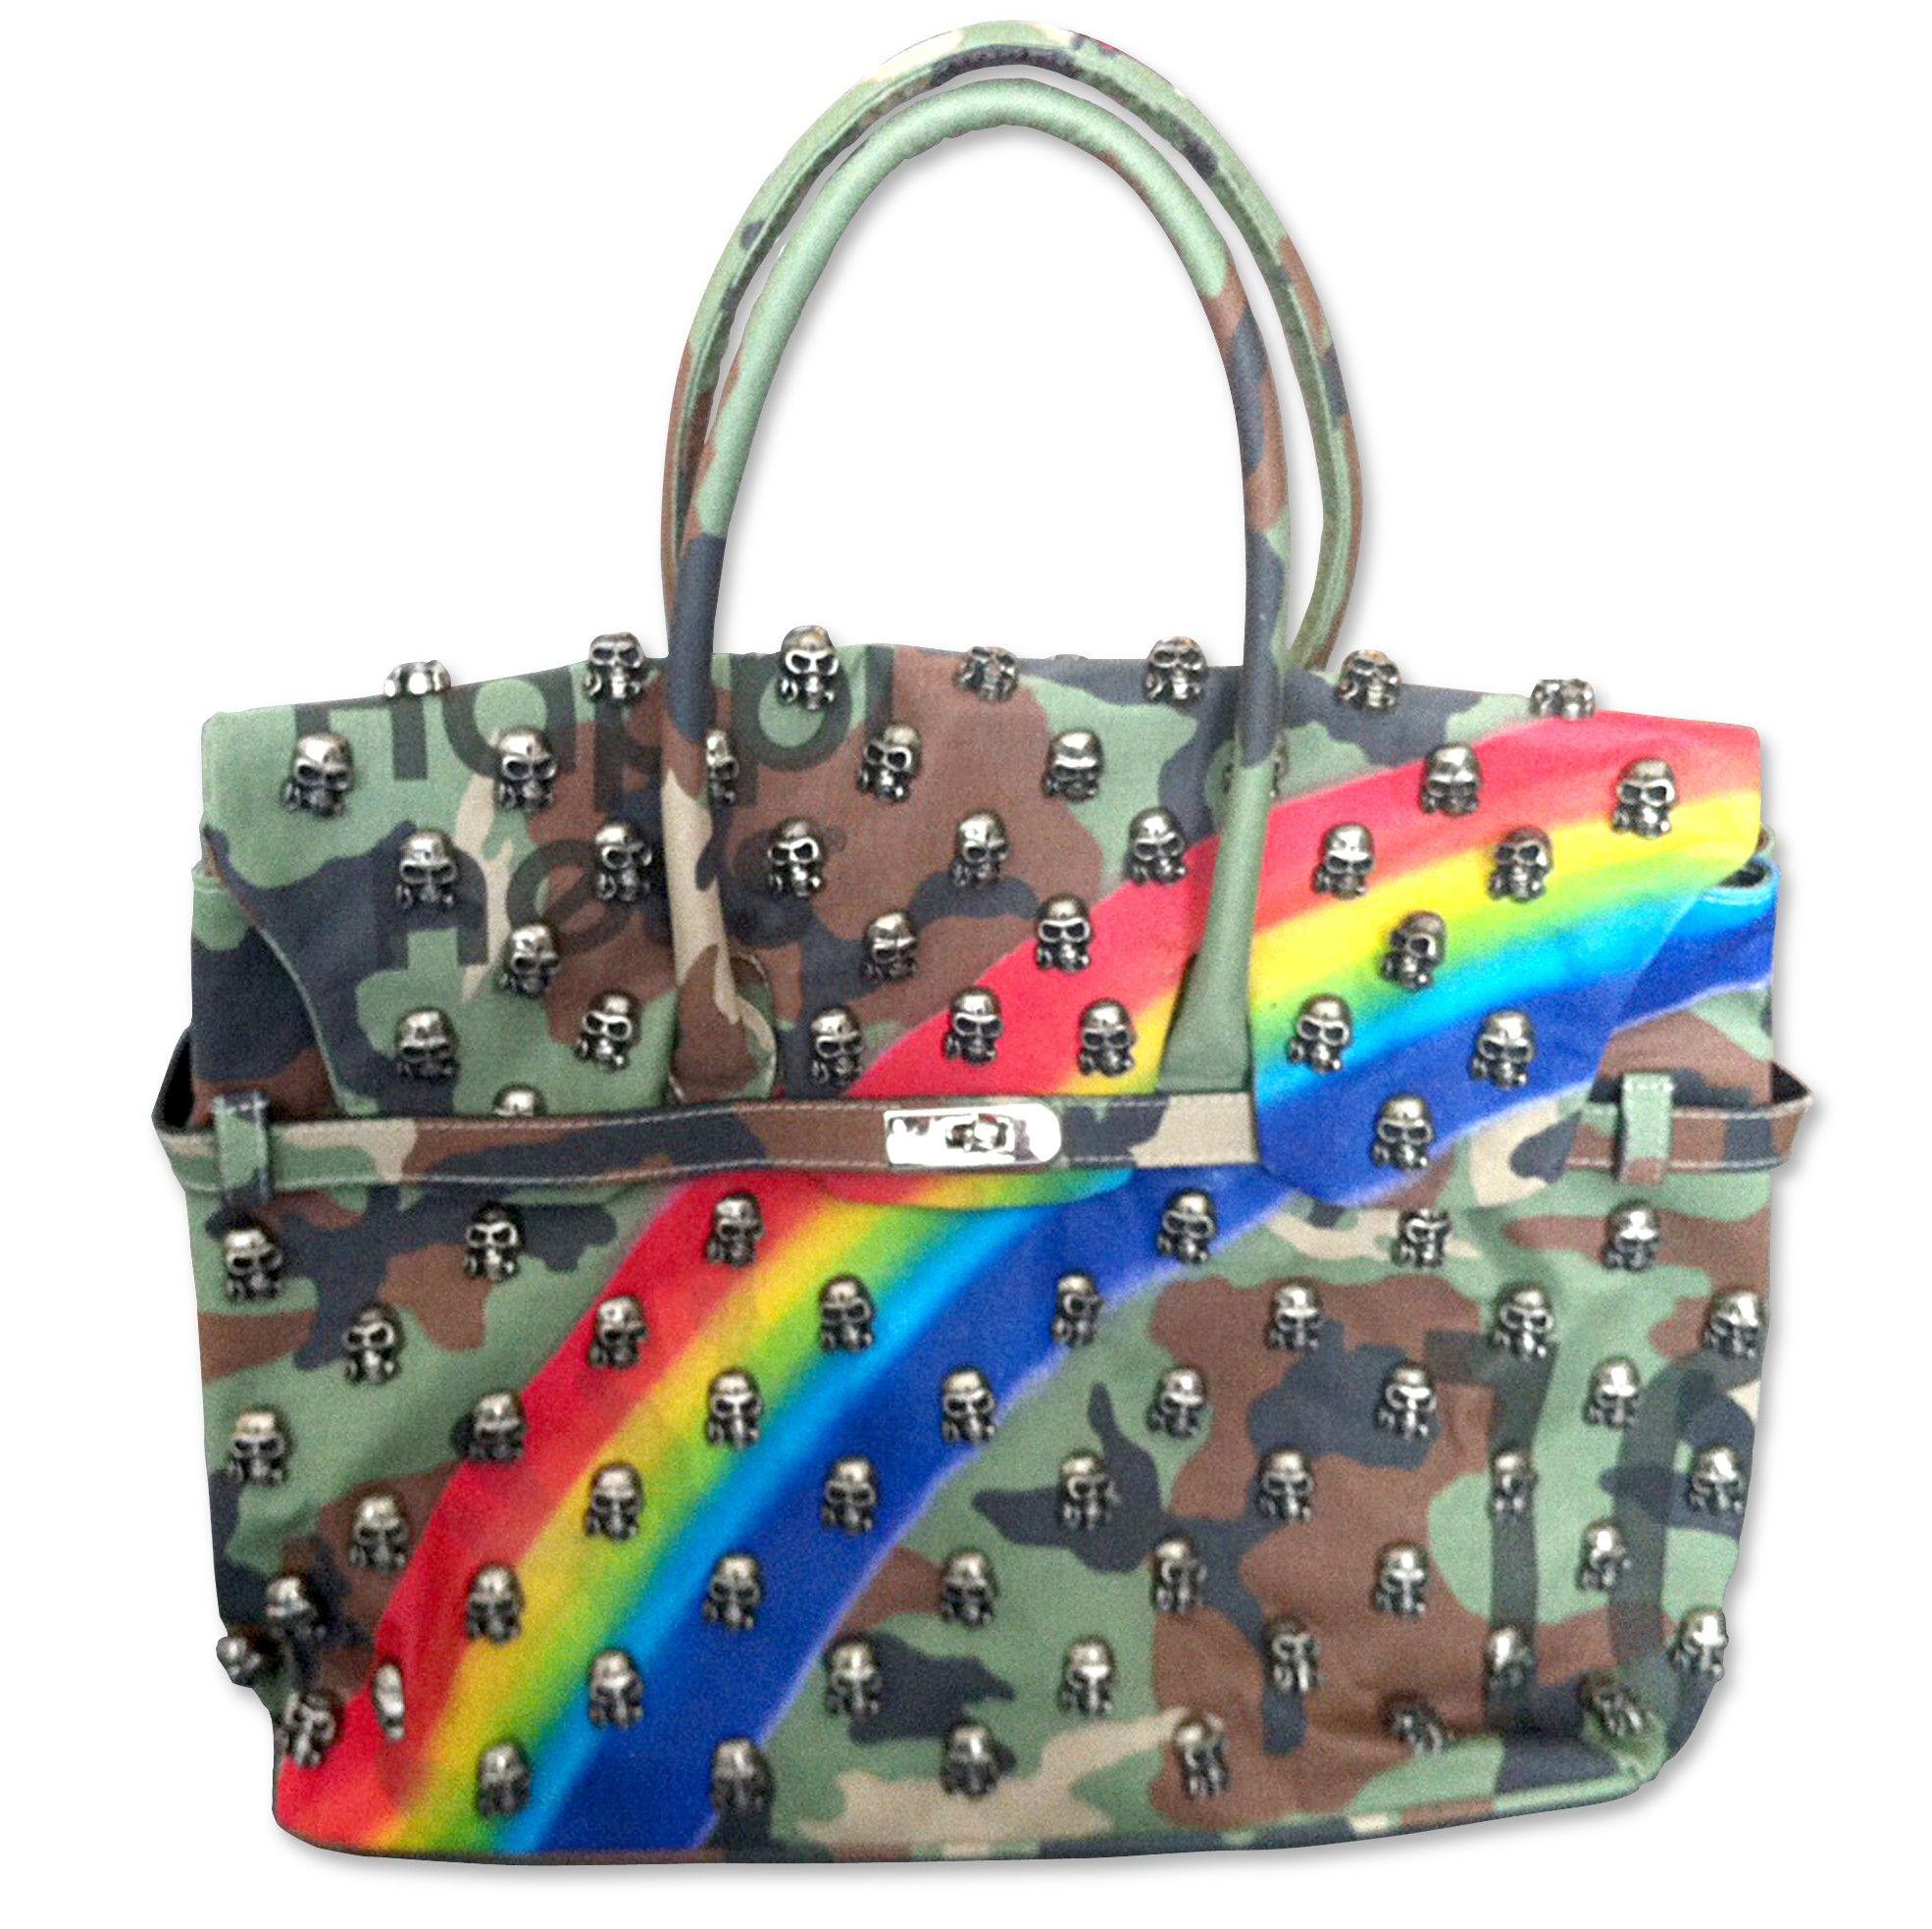 Borsa moda HAPPINESS MIA BAG BORCHIE teschi nuovo Tg. MEDIA